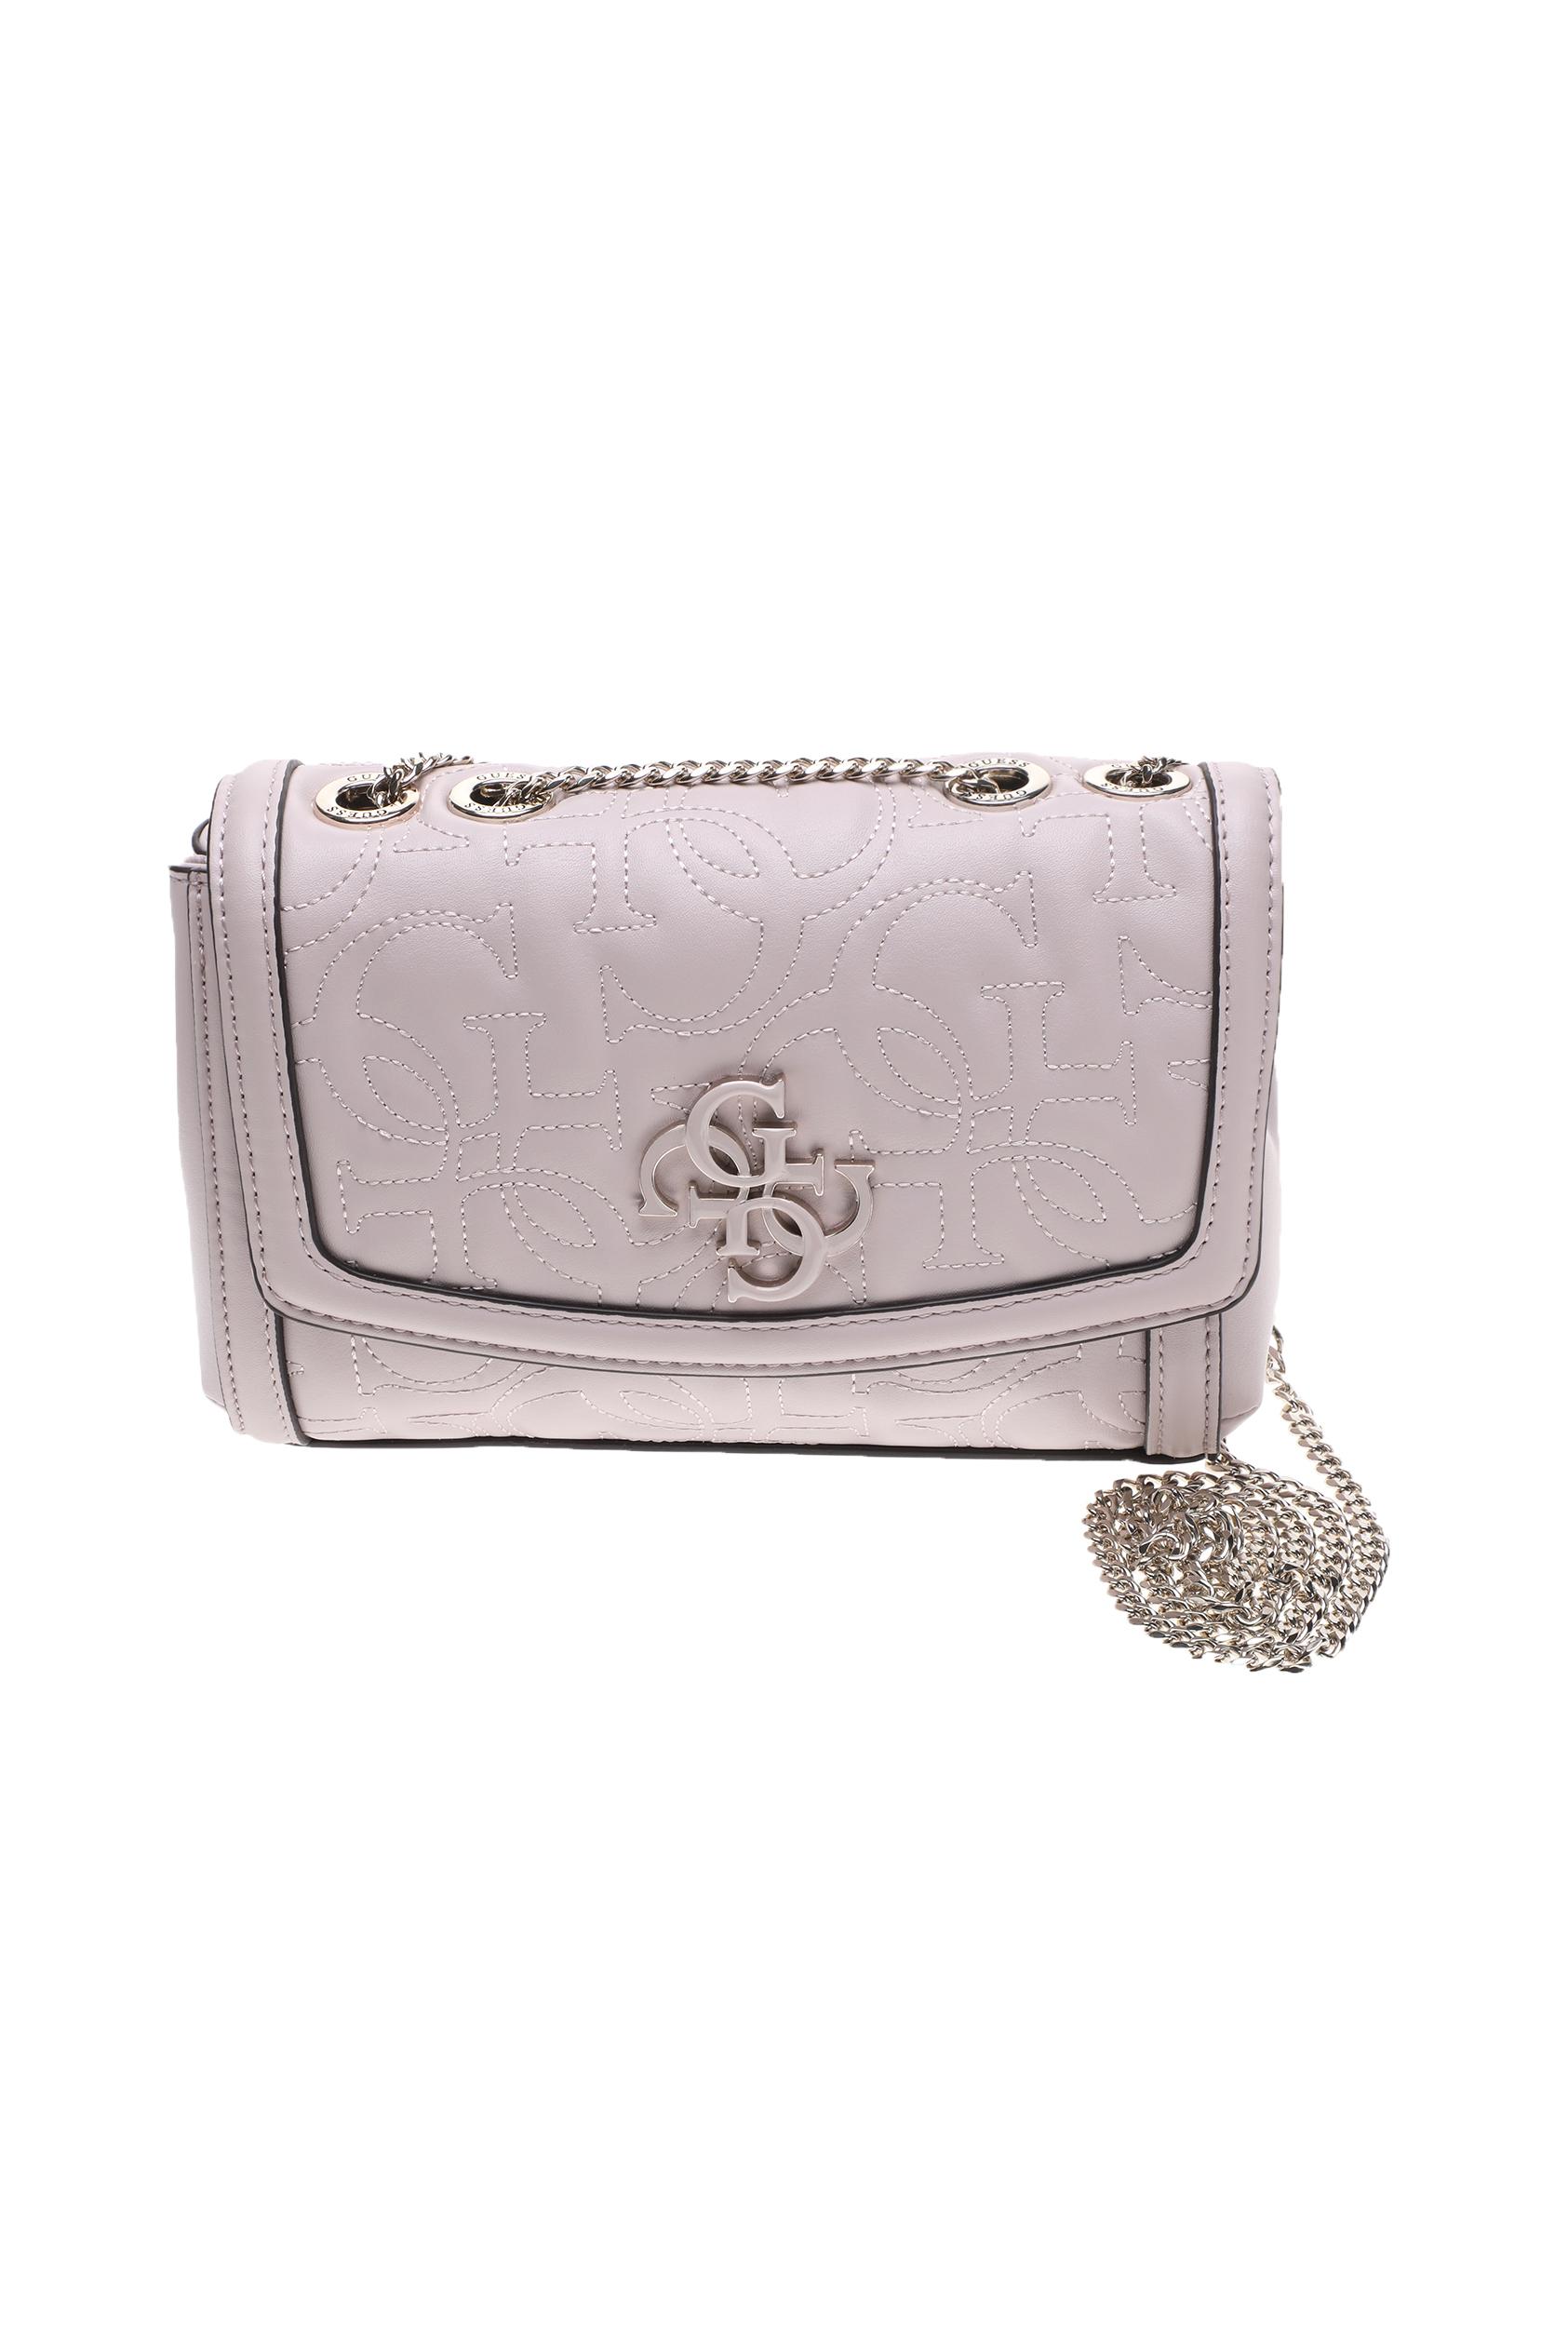 GUESS - Γυναικεία τσάντα ώμου GUESS NEW WAVE MINI μπεζ γυναικεία αξεσουάρ τσάντες σακίδια ωμου